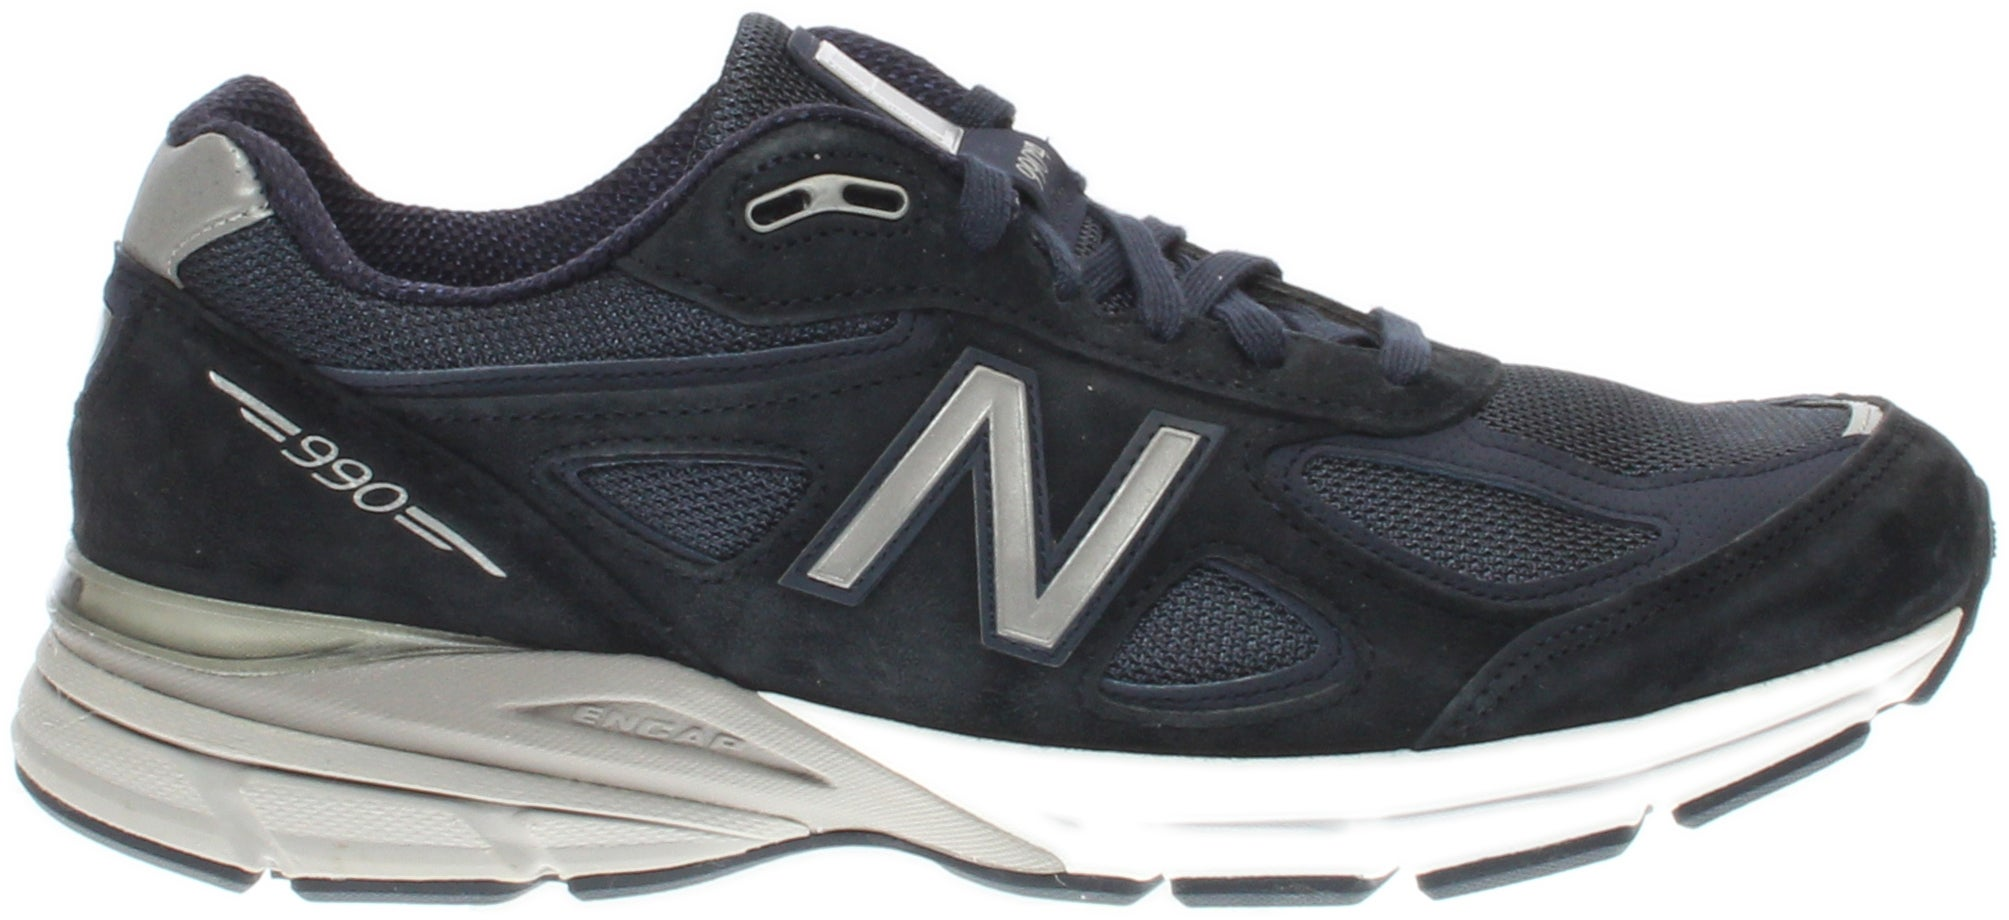 New Balance 990 -  889516458303